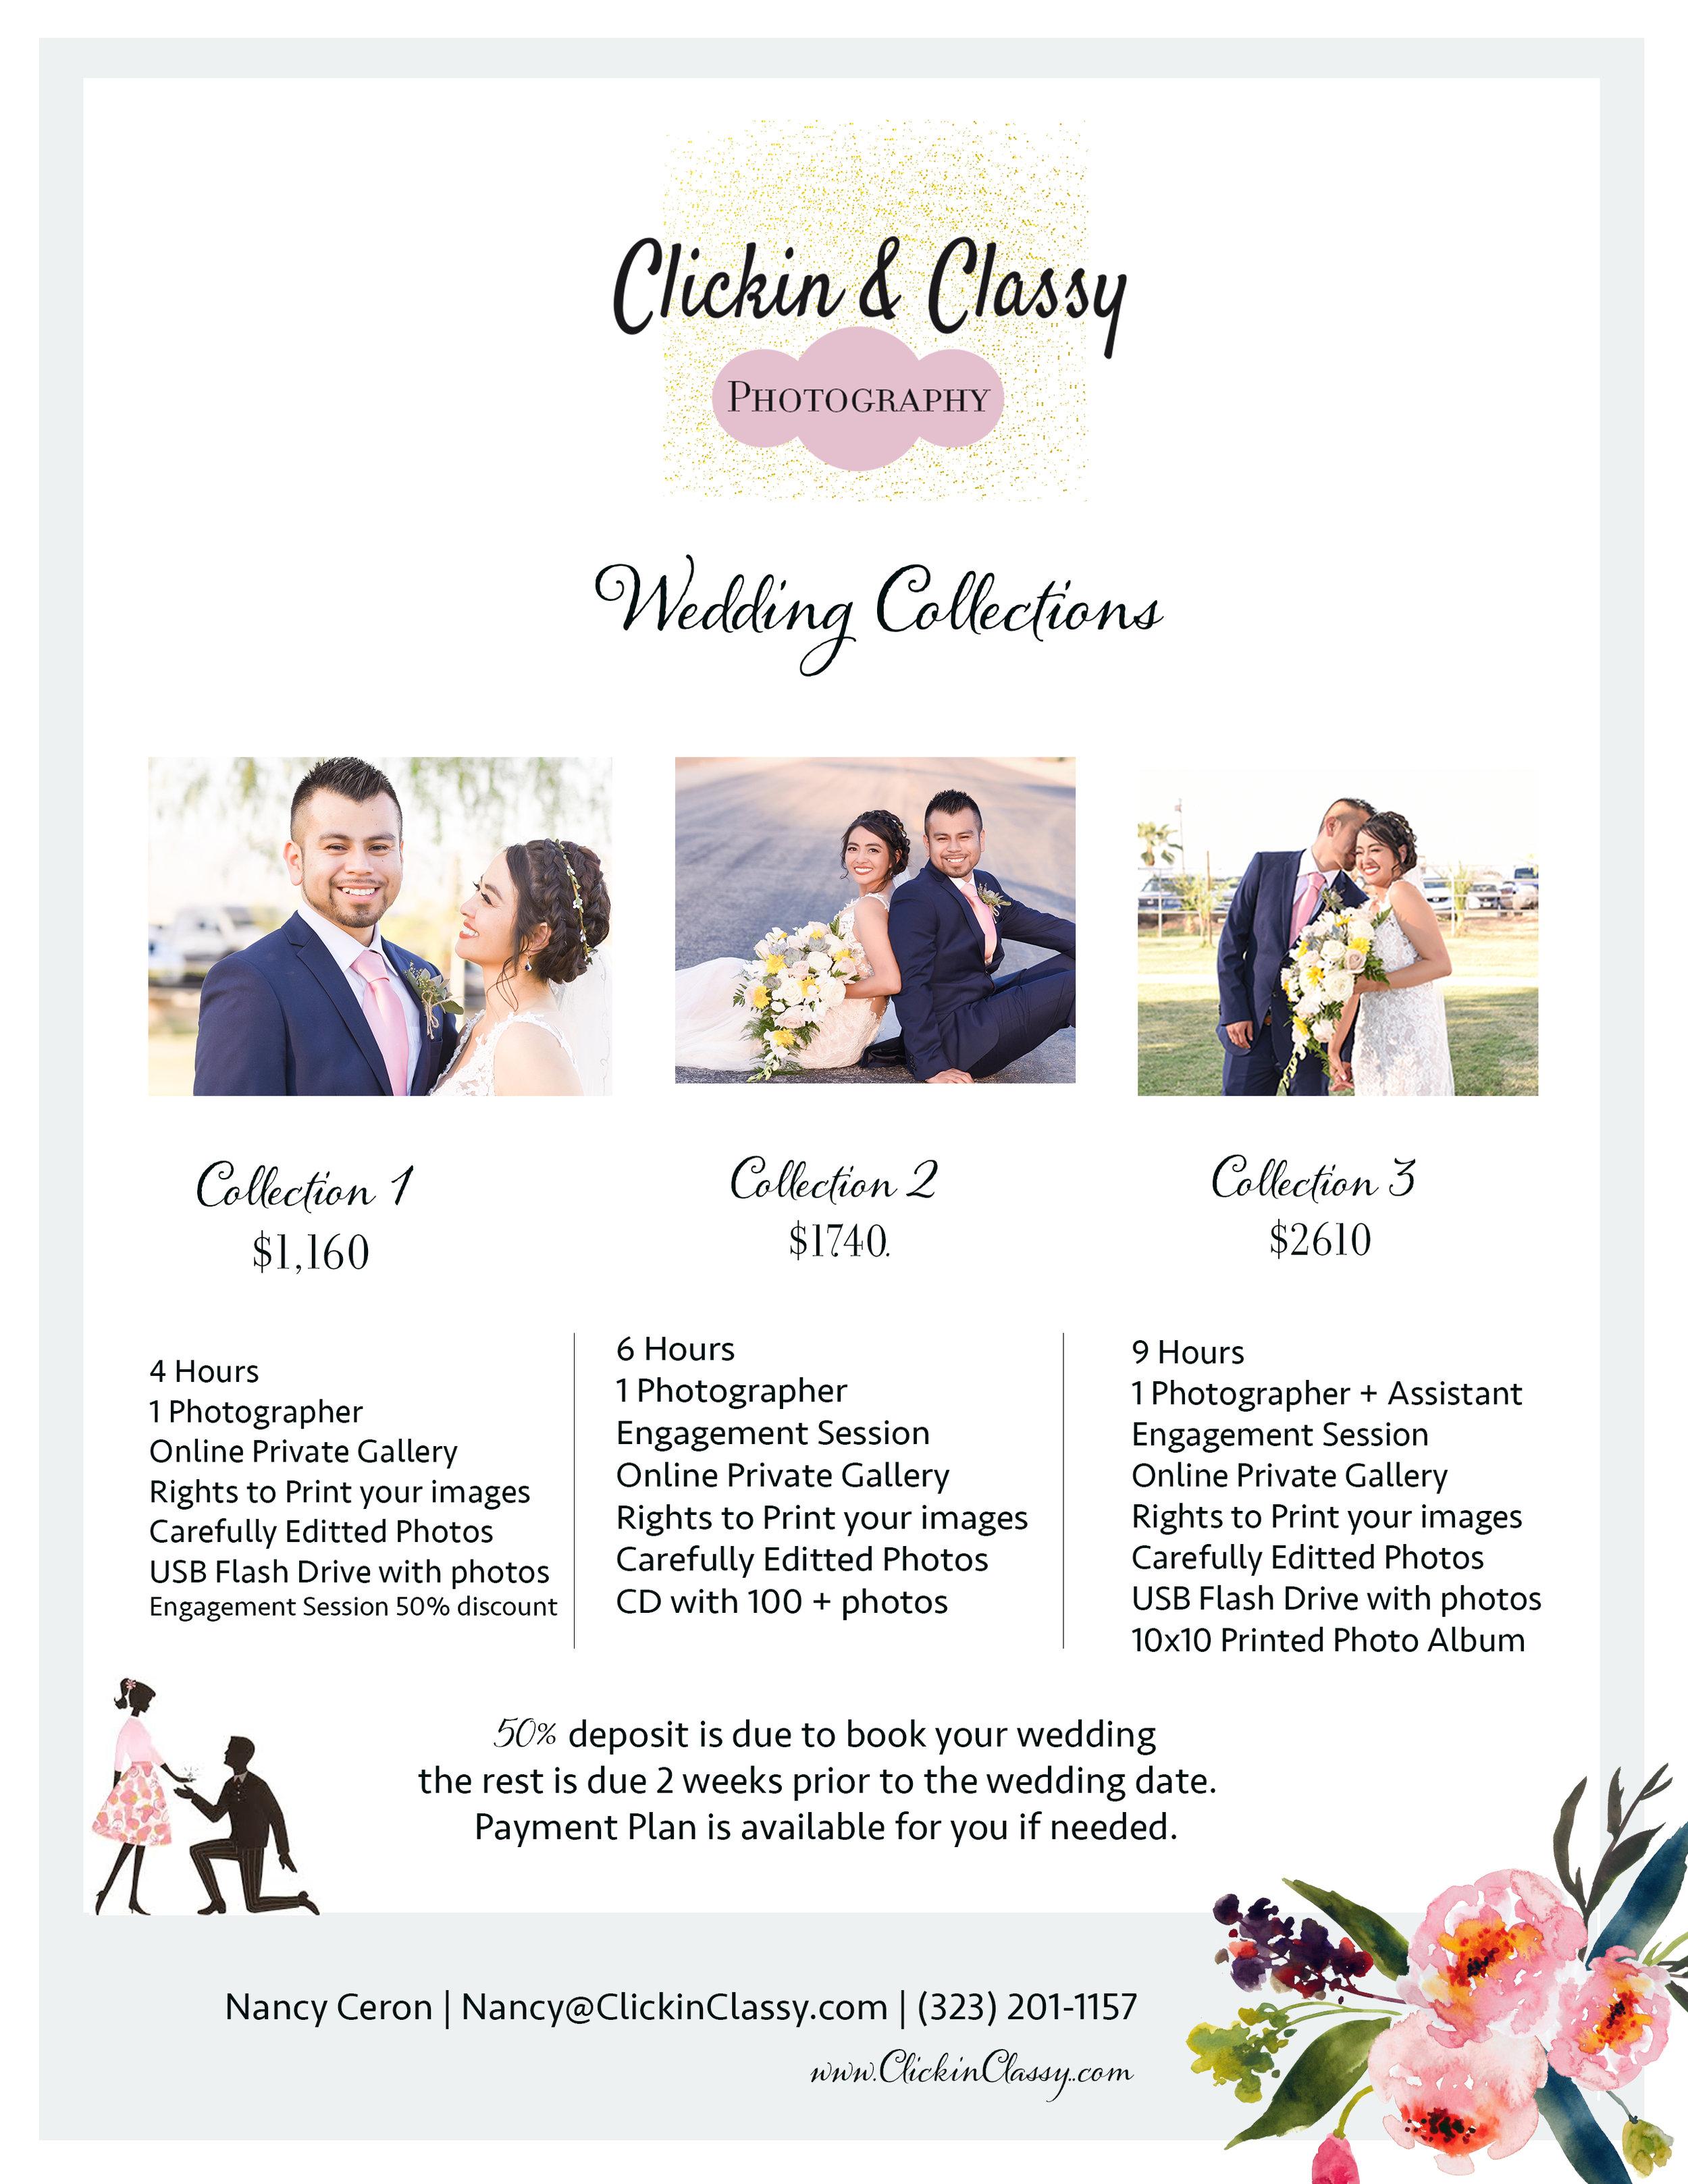 weddingcollections.jpg